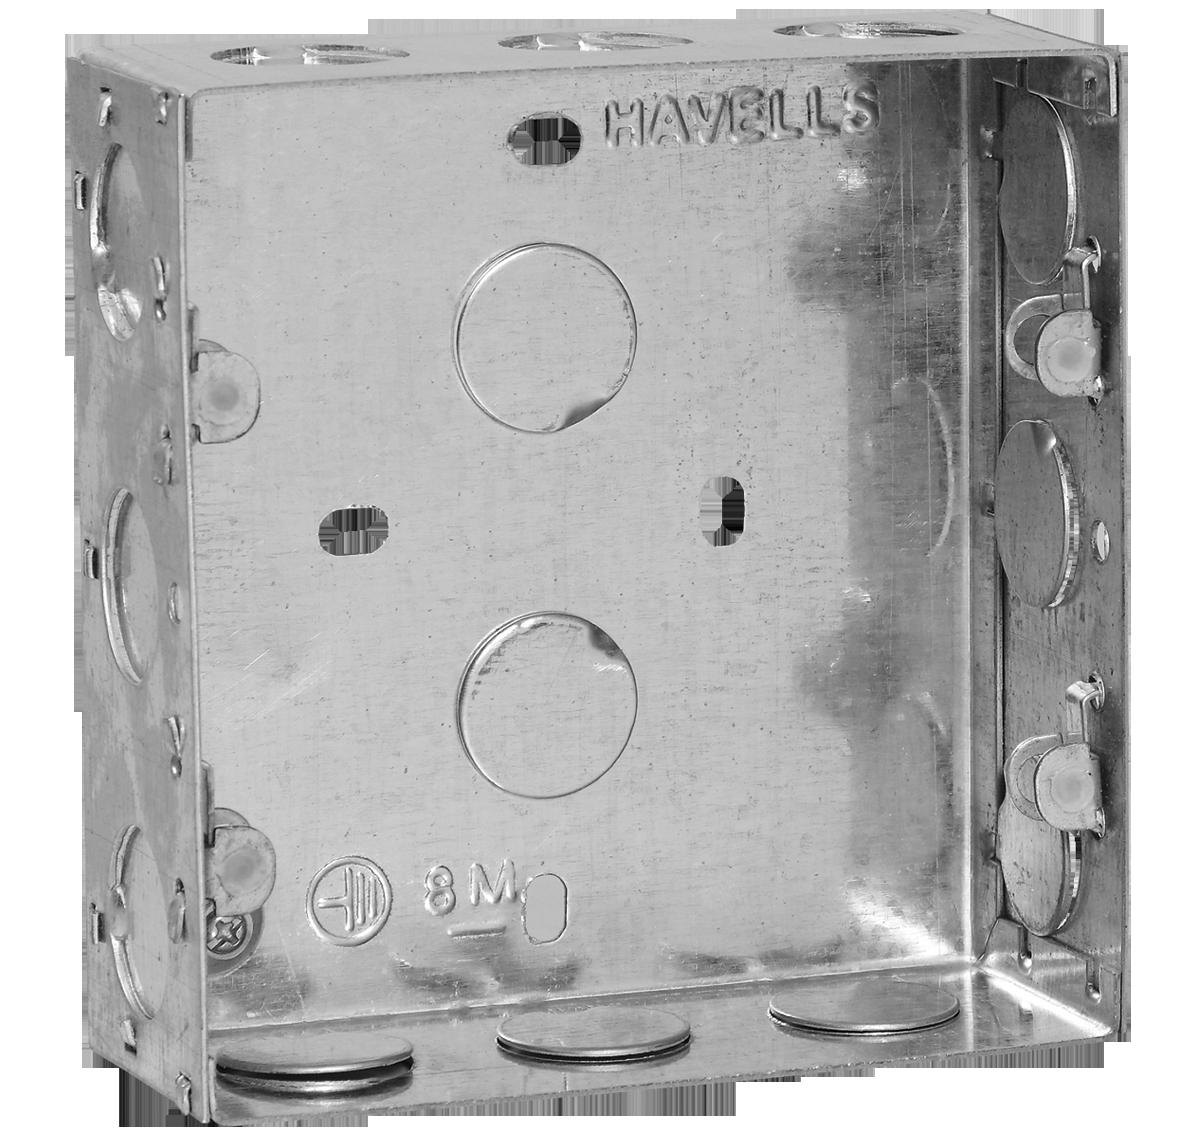 Metal Boxes Online Flush Box Havells India Wiring Back 8 M